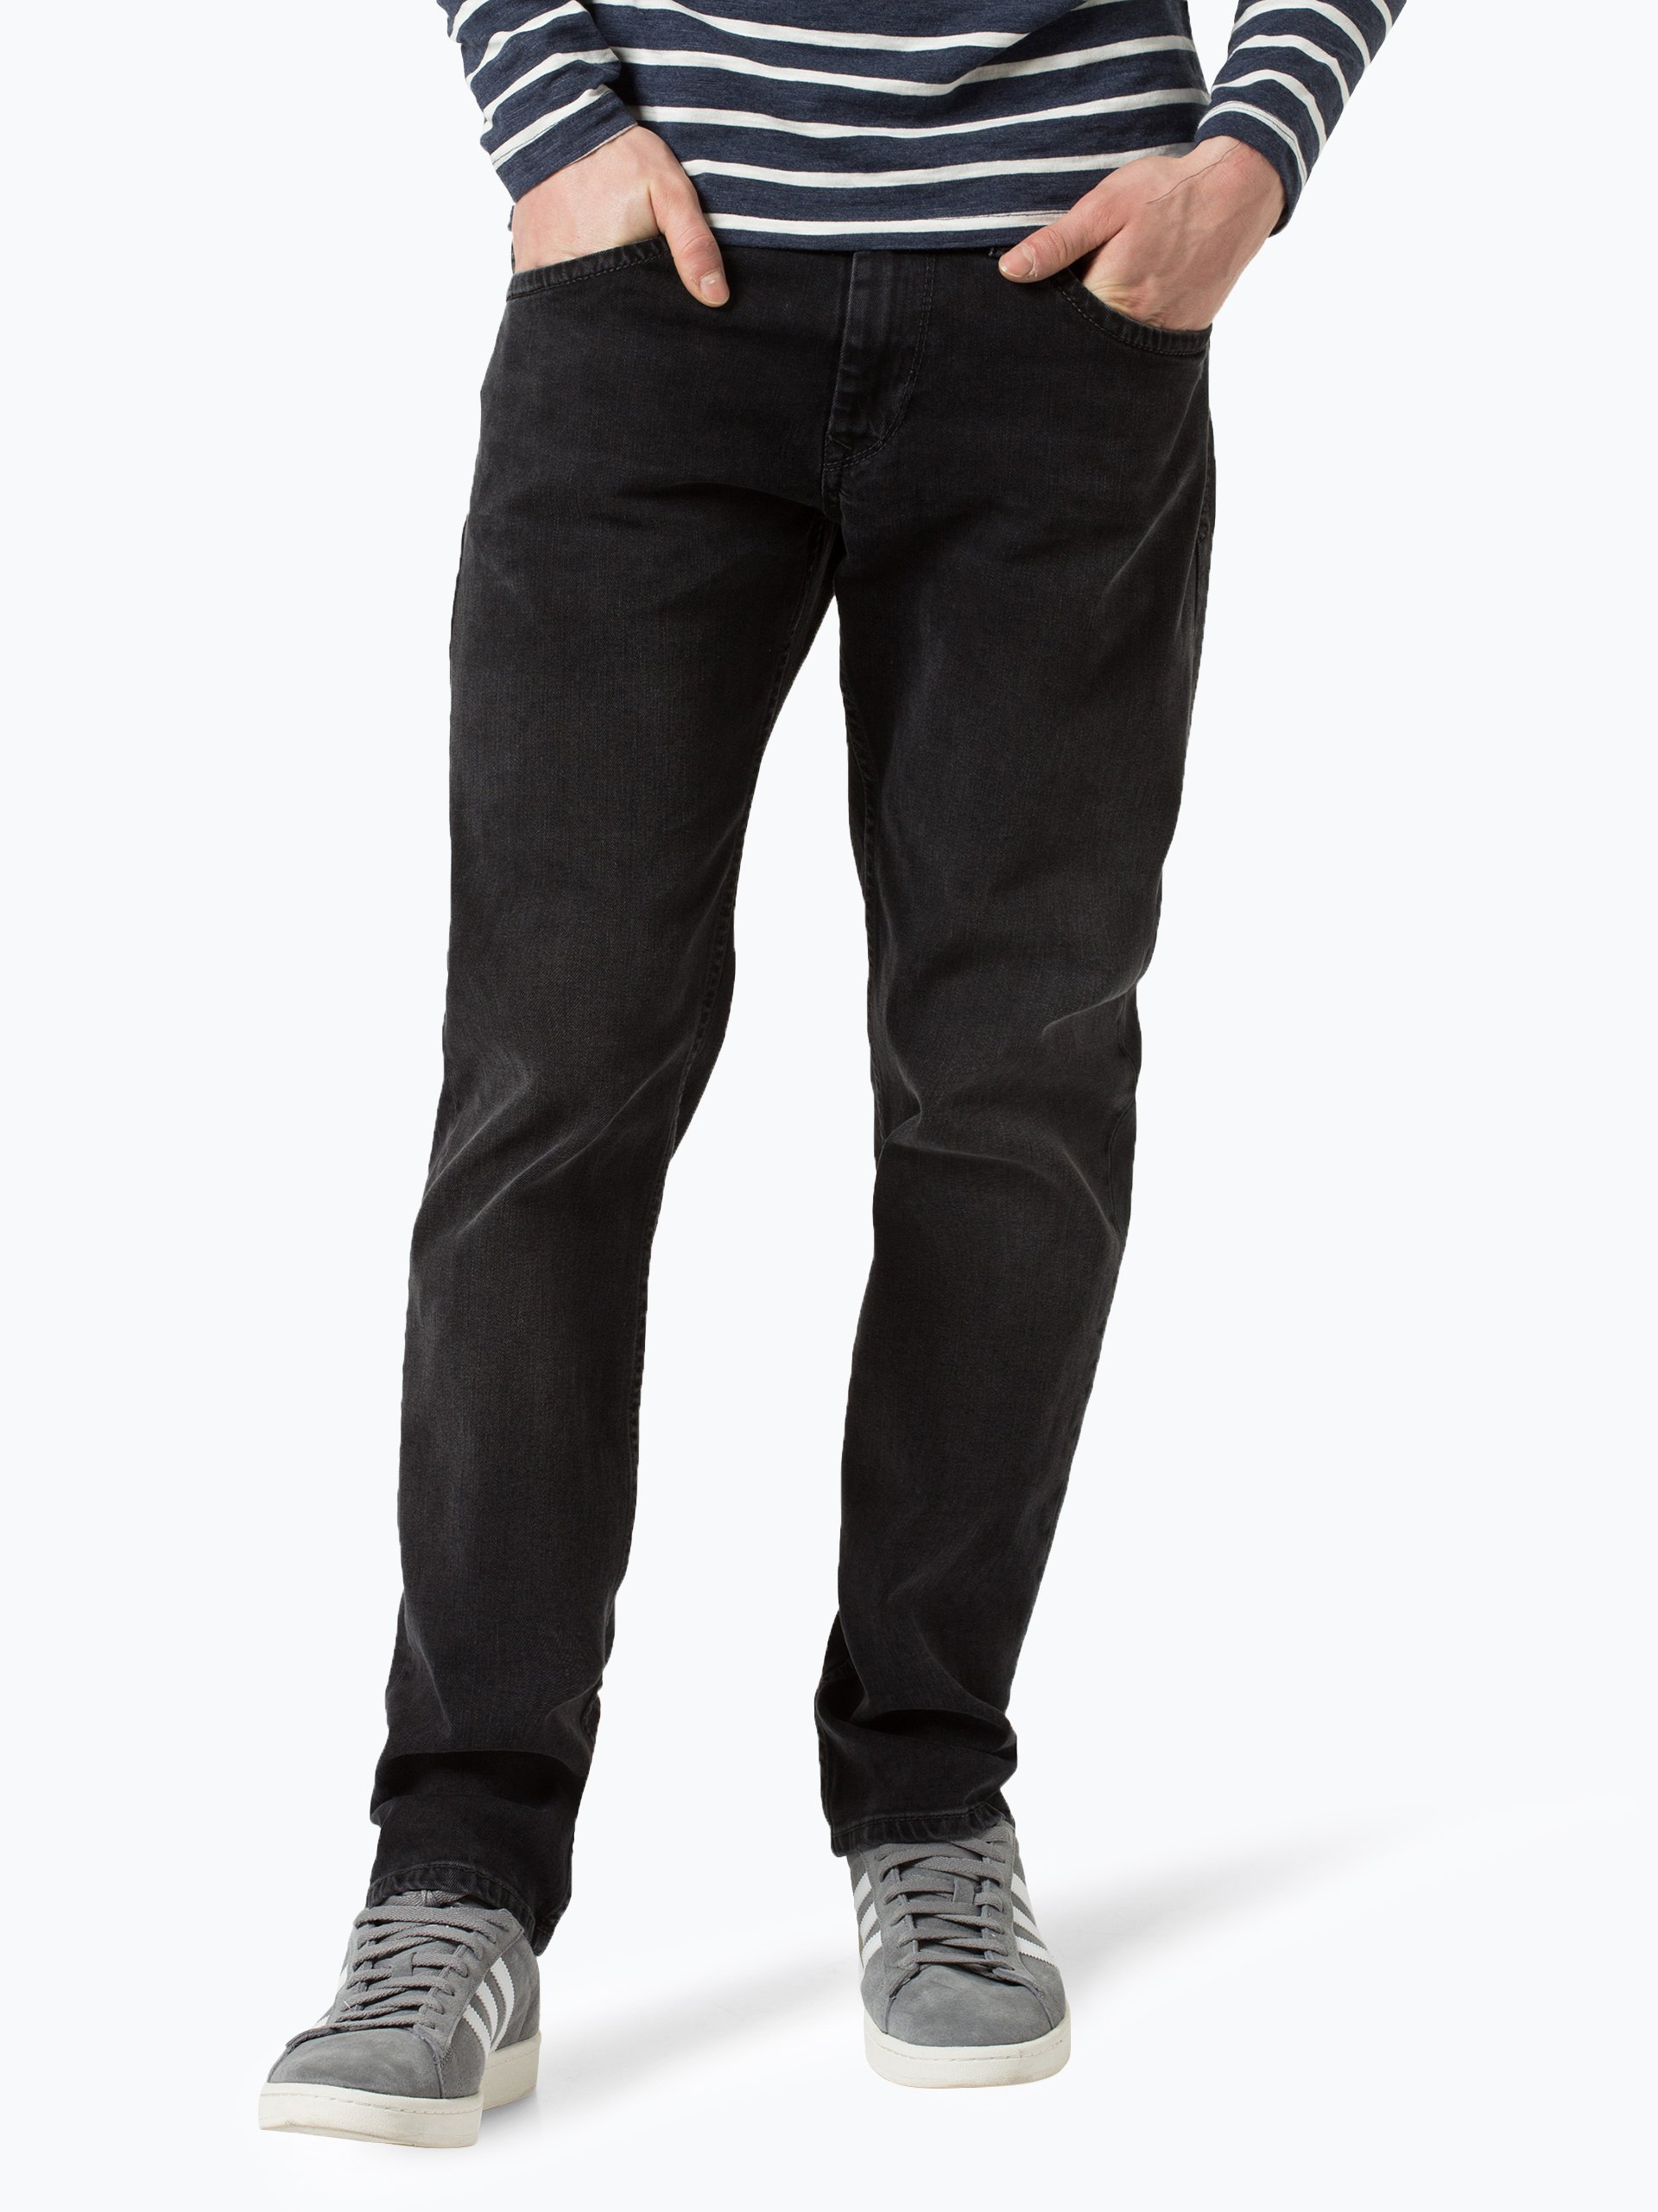 pepe jeans herren jeans kingston schwarz uni online kaufen vangraaf com. Black Bedroom Furniture Sets. Home Design Ideas